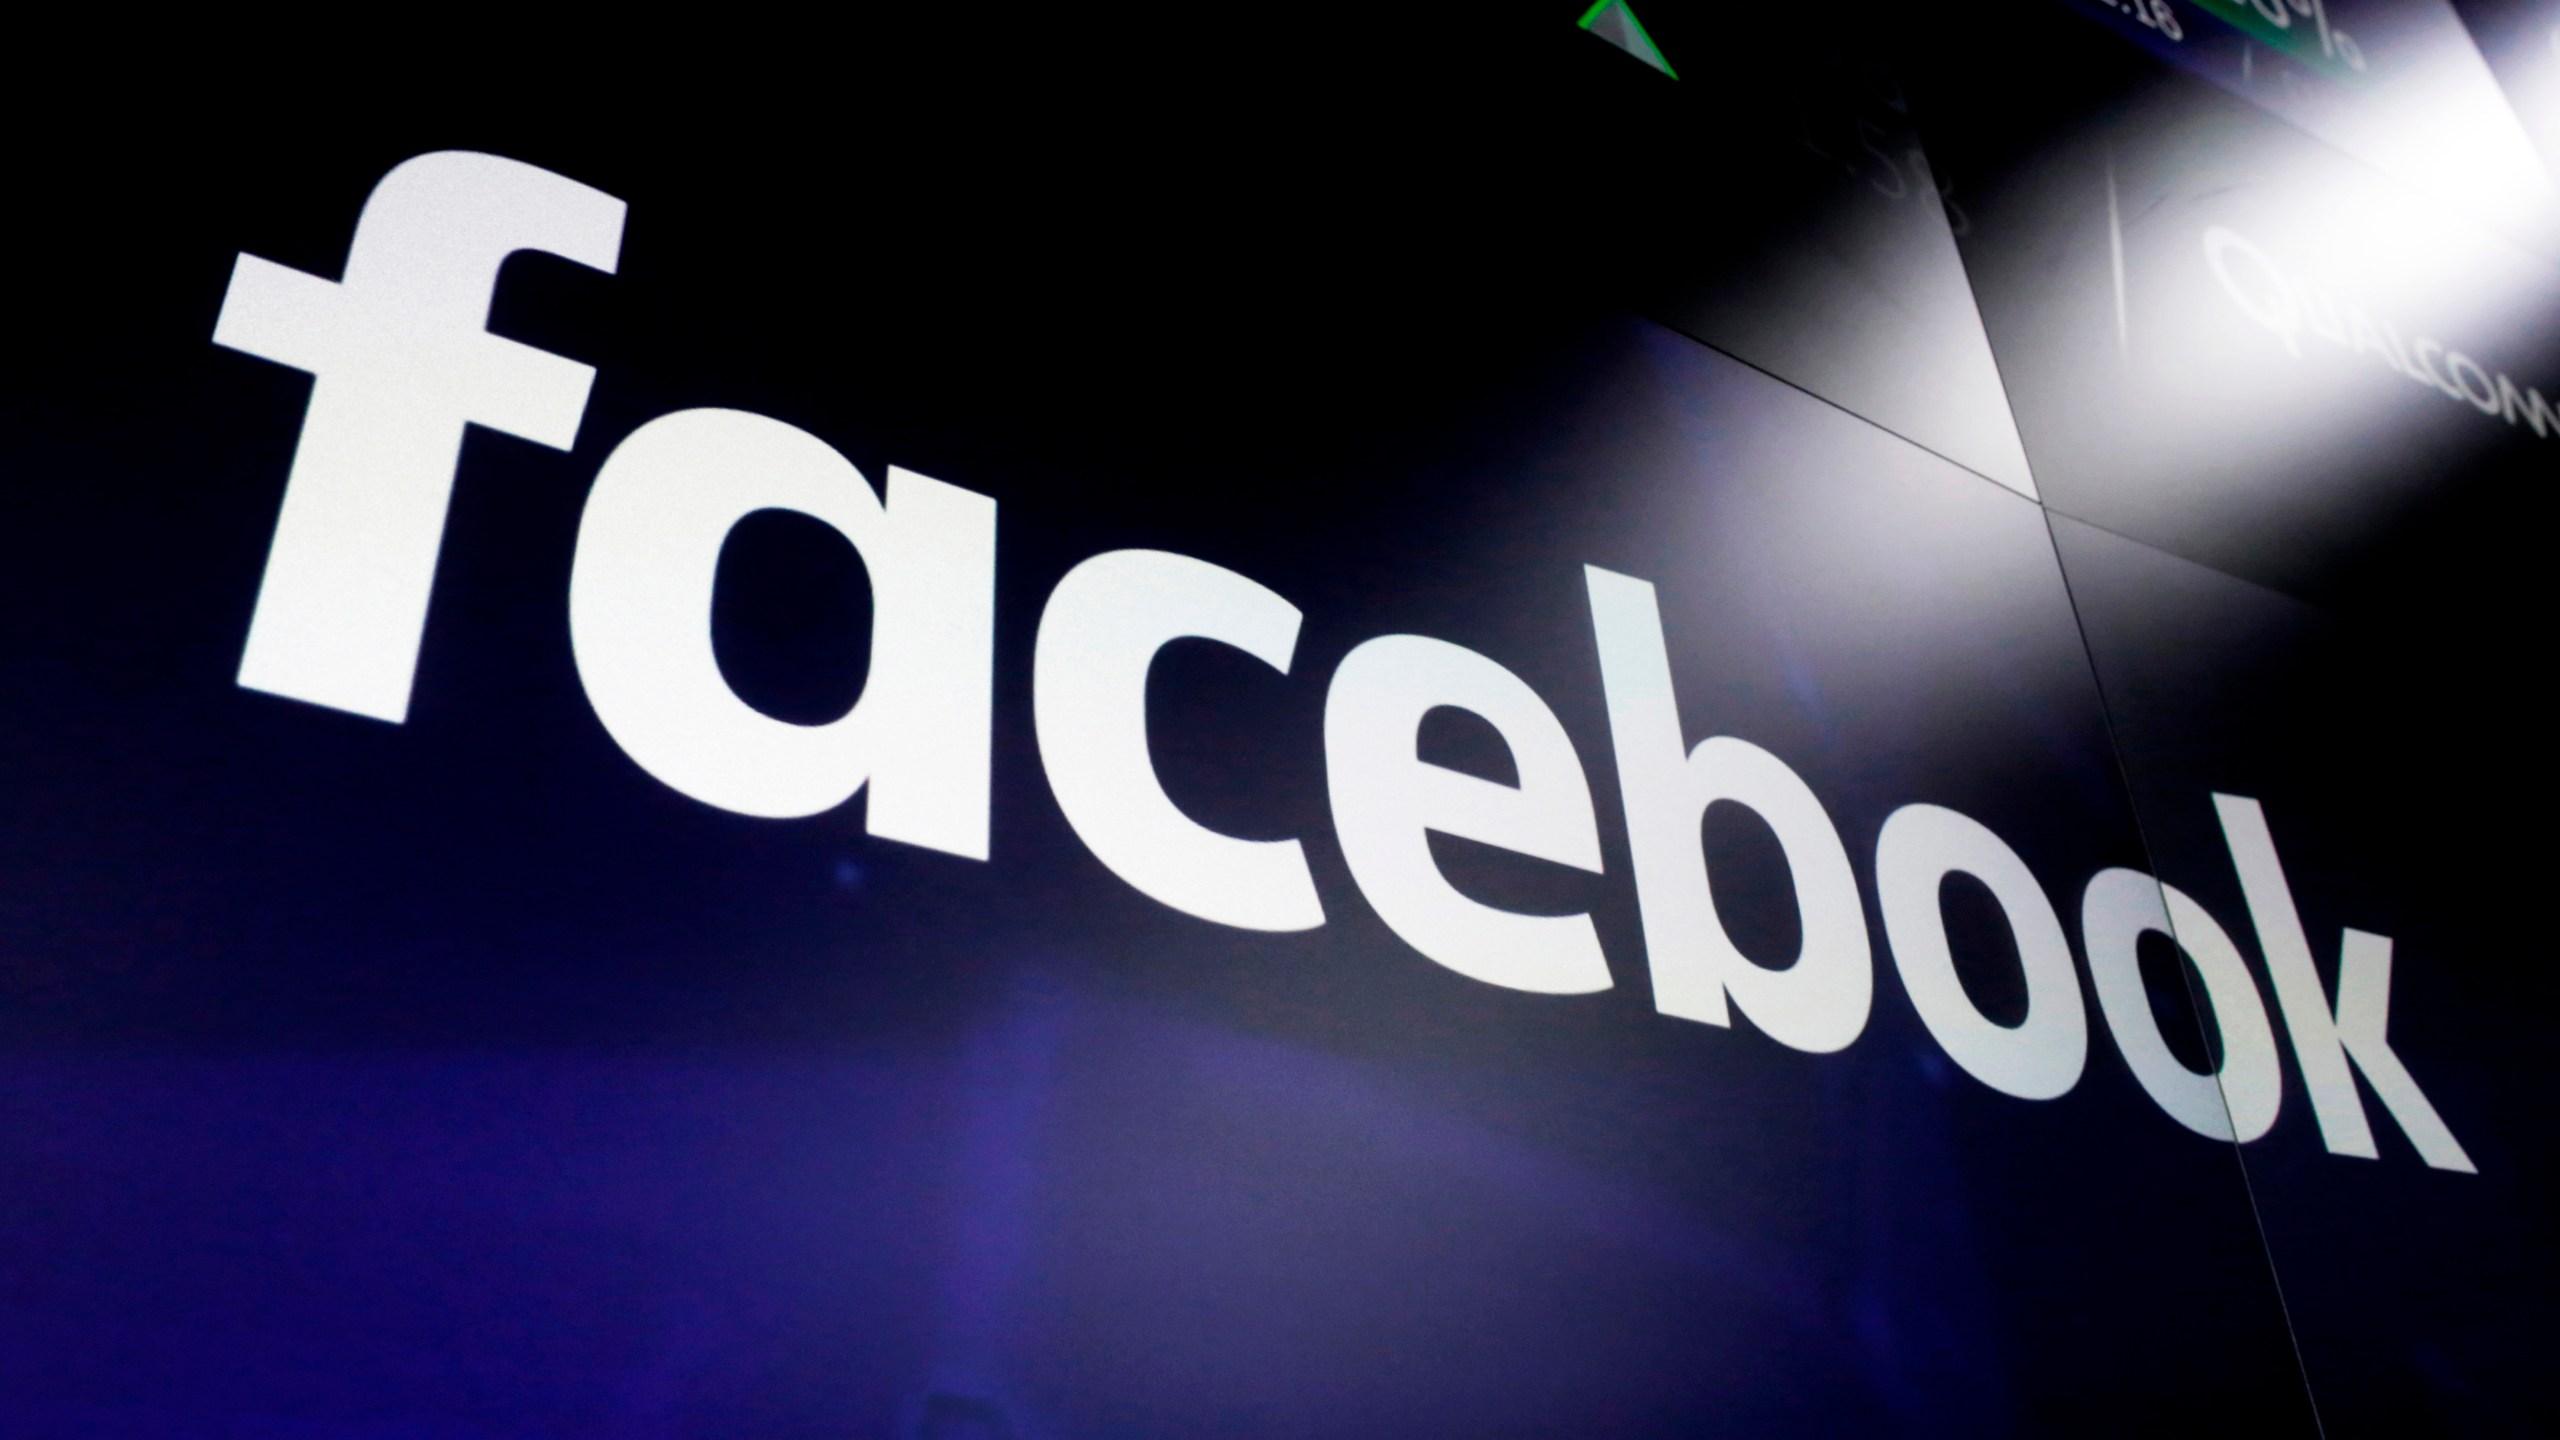 Facebook-Local_News_20098-159532.jpg37802936